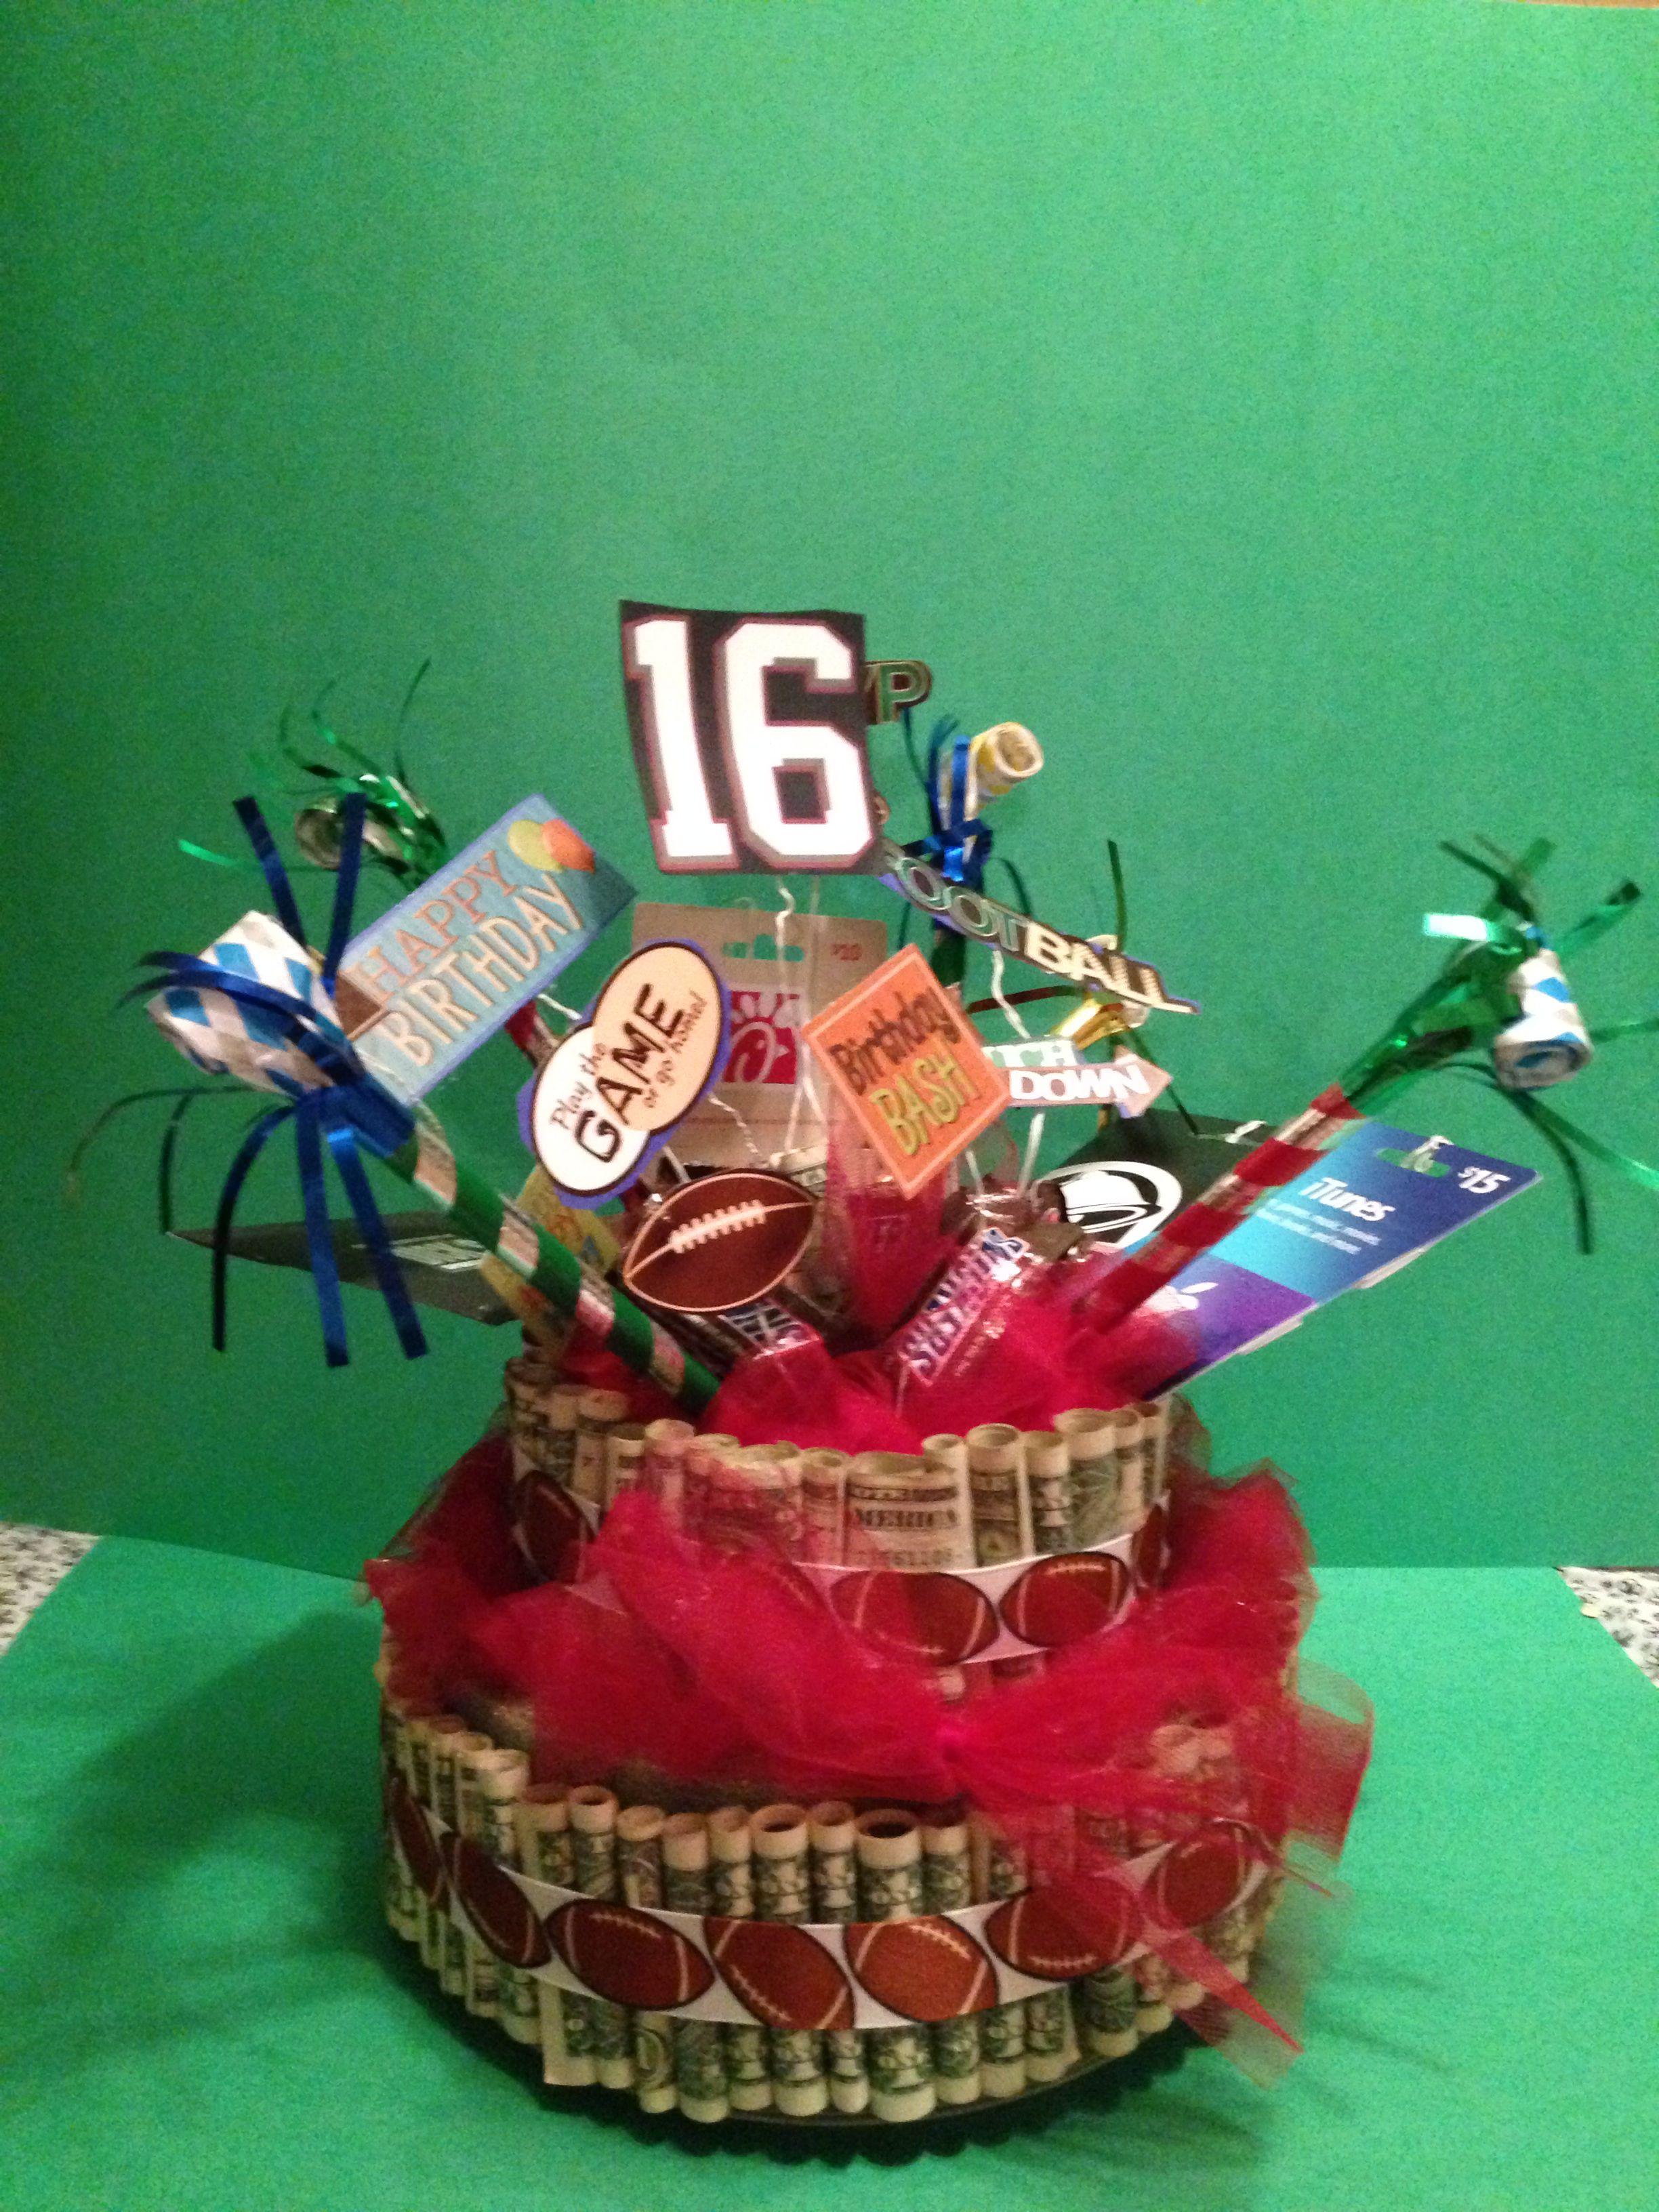 16th birthday money cake birthday money money creation